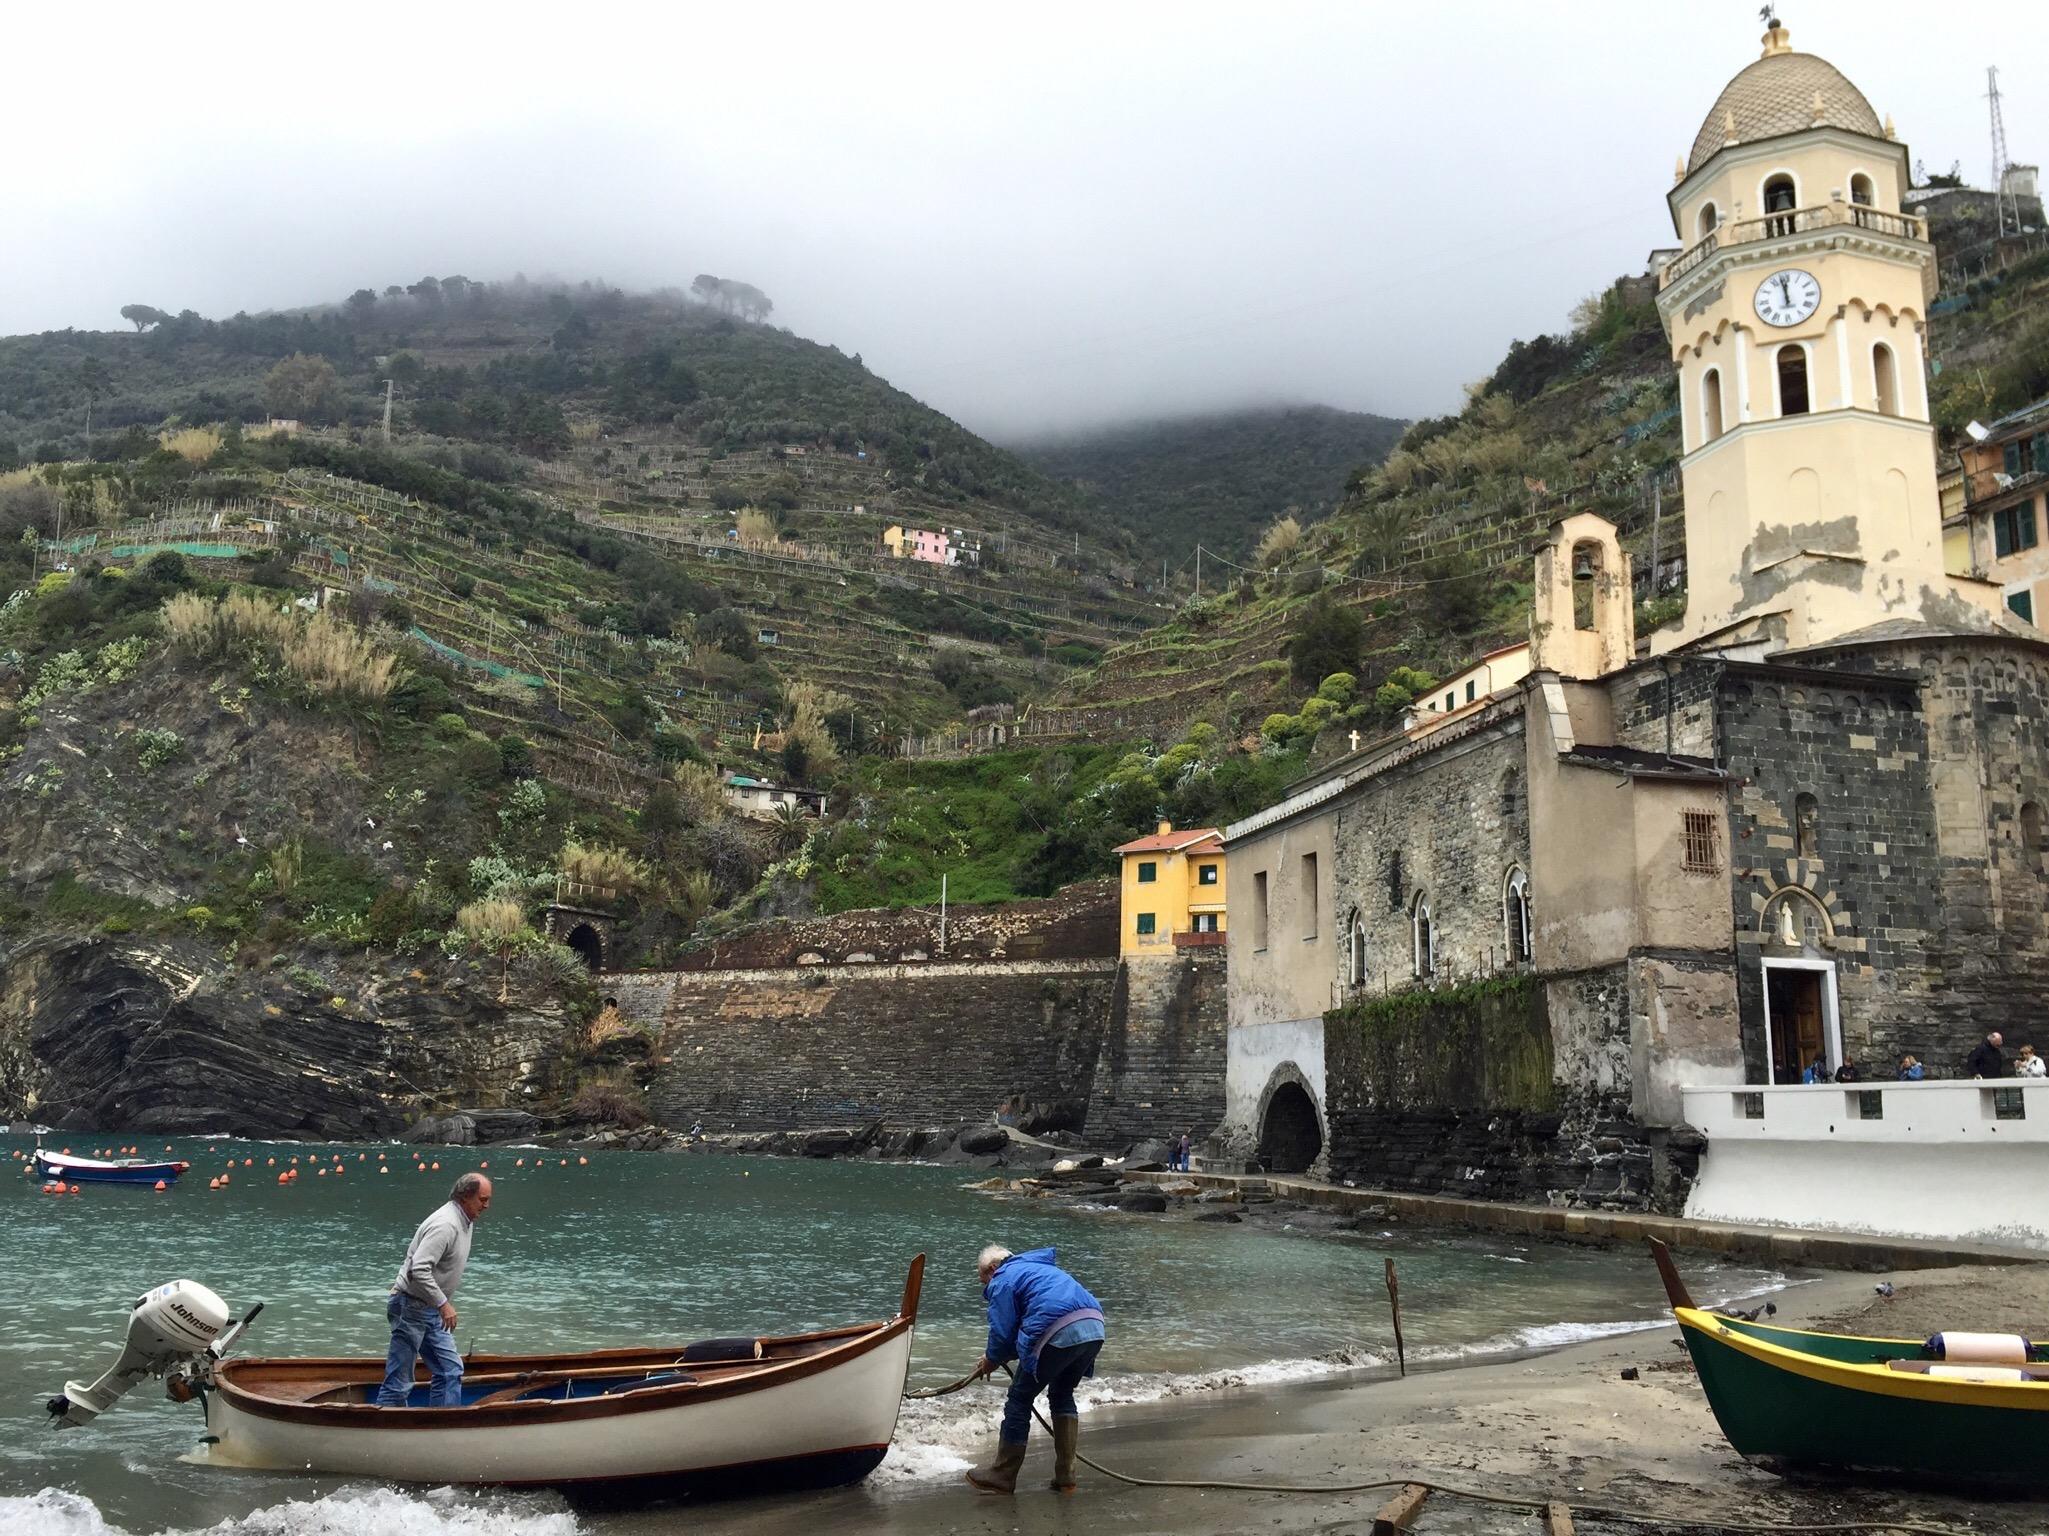 Vernazza's harbor